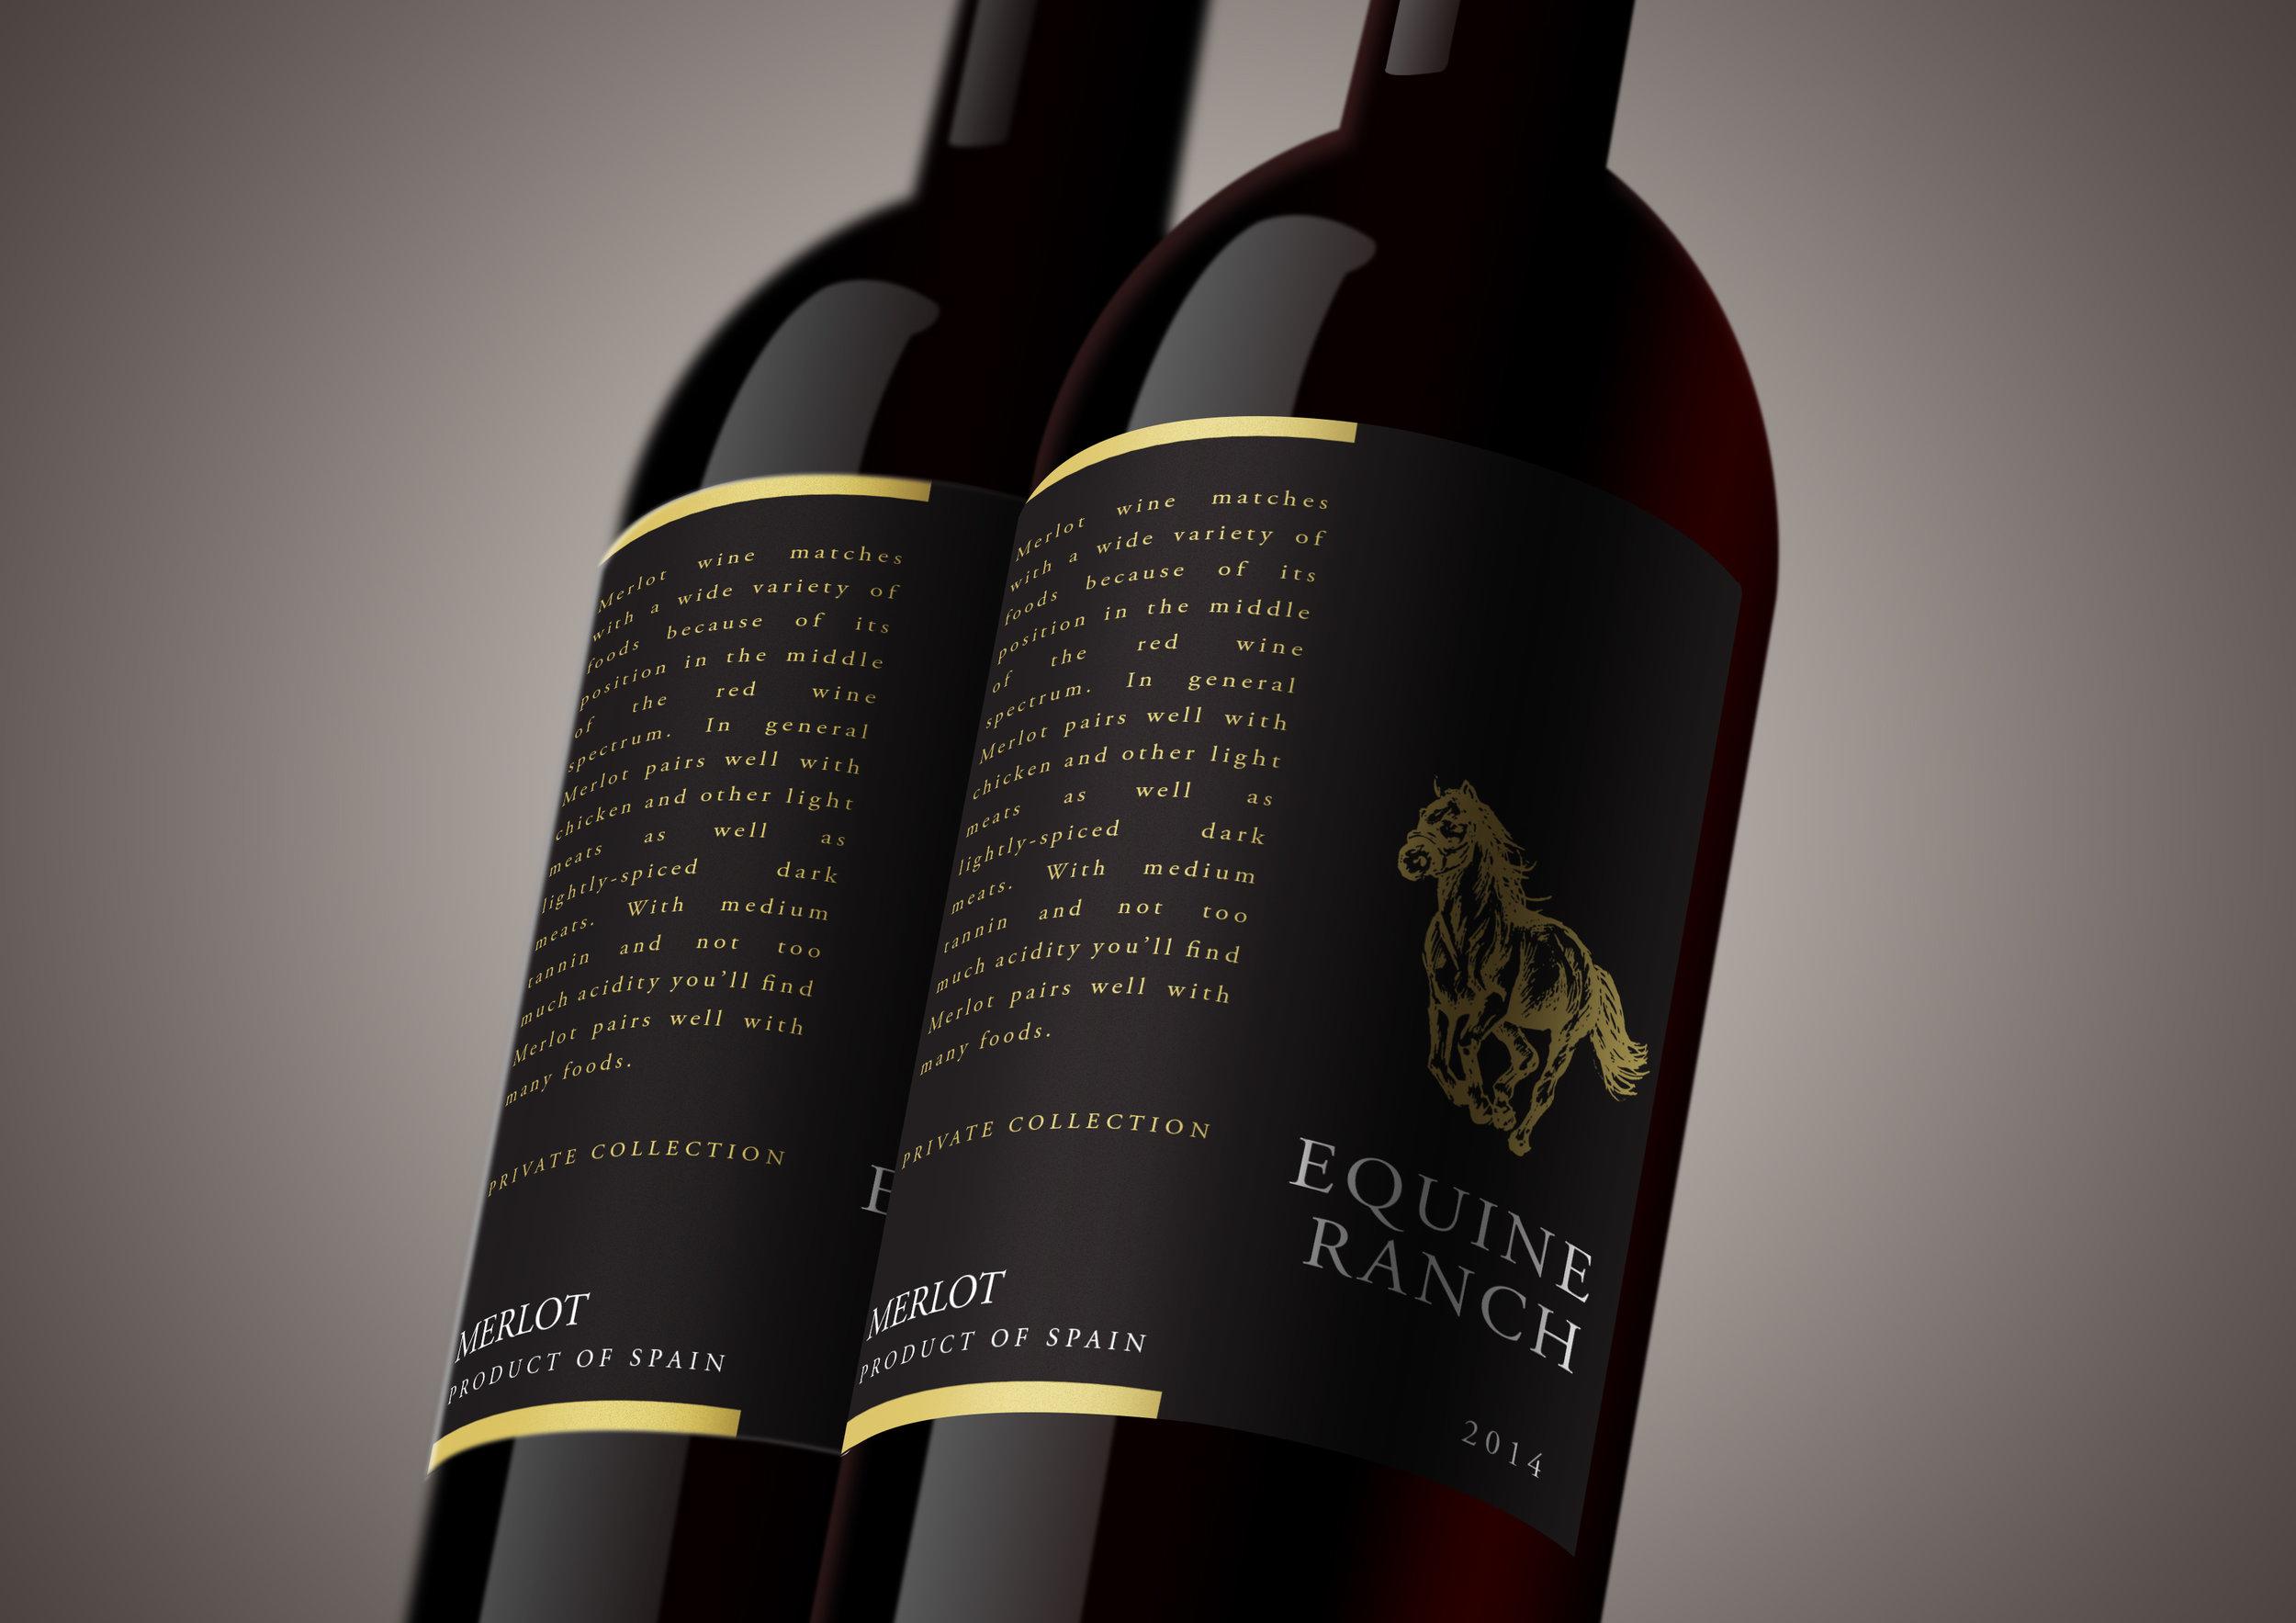 Equine Ranch 2 bottle shot.jpg